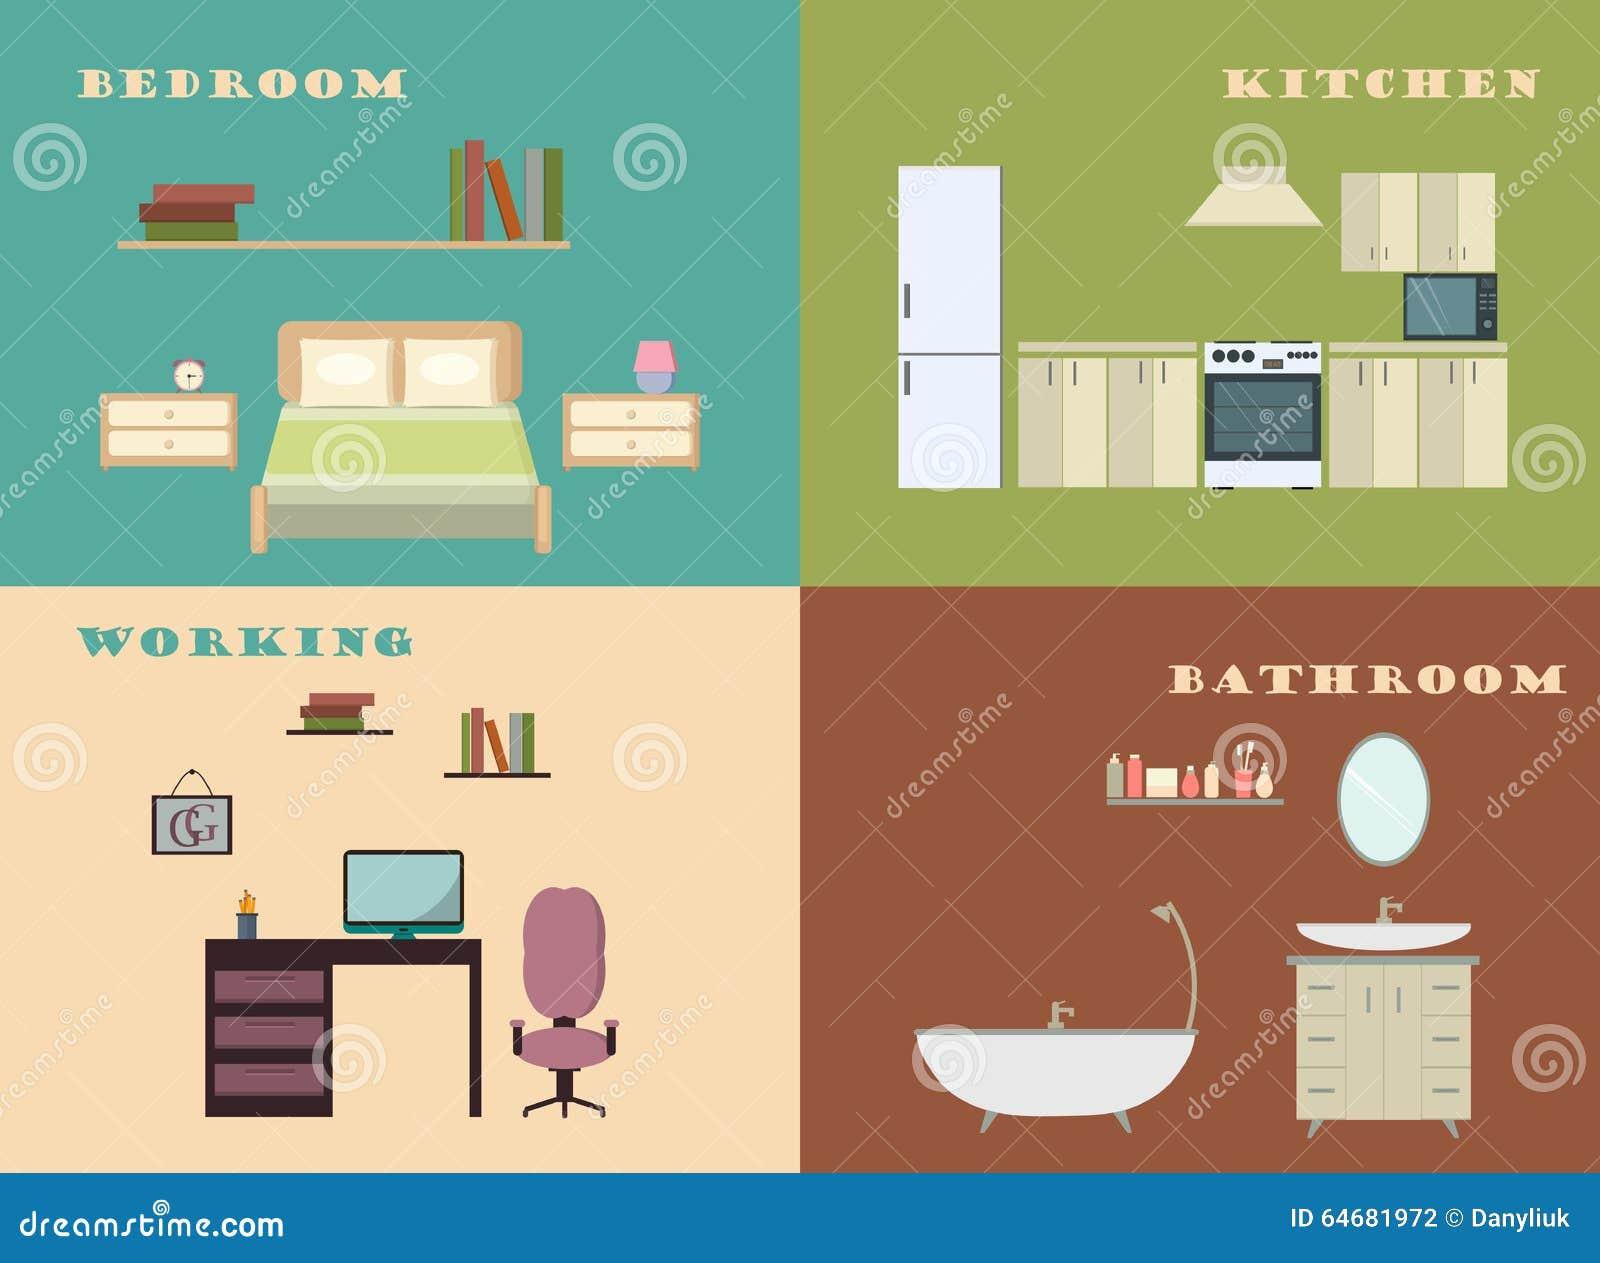 Architecture Design Elements Flat Illustration Infographic Interior